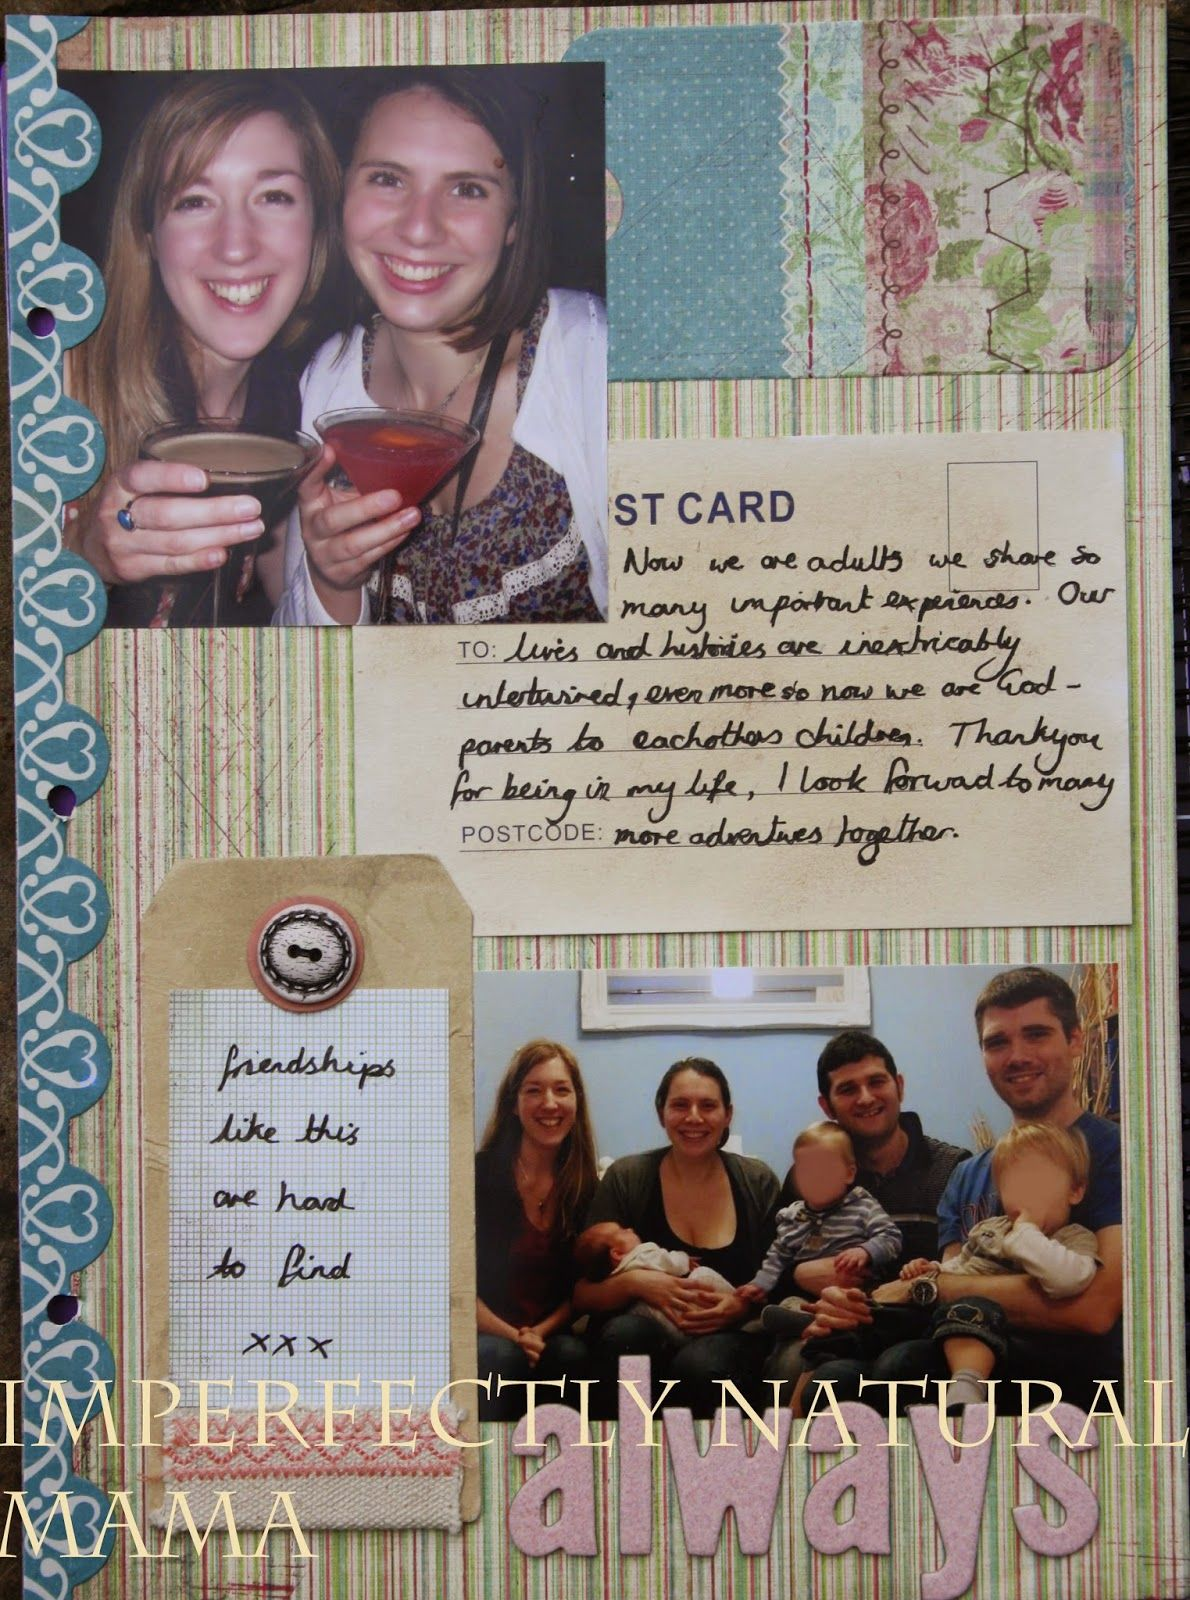 How to scrapbook uk - Best Friends Scrapbook Pages Http Www Imperfectlynaturalmama Blogspot Co